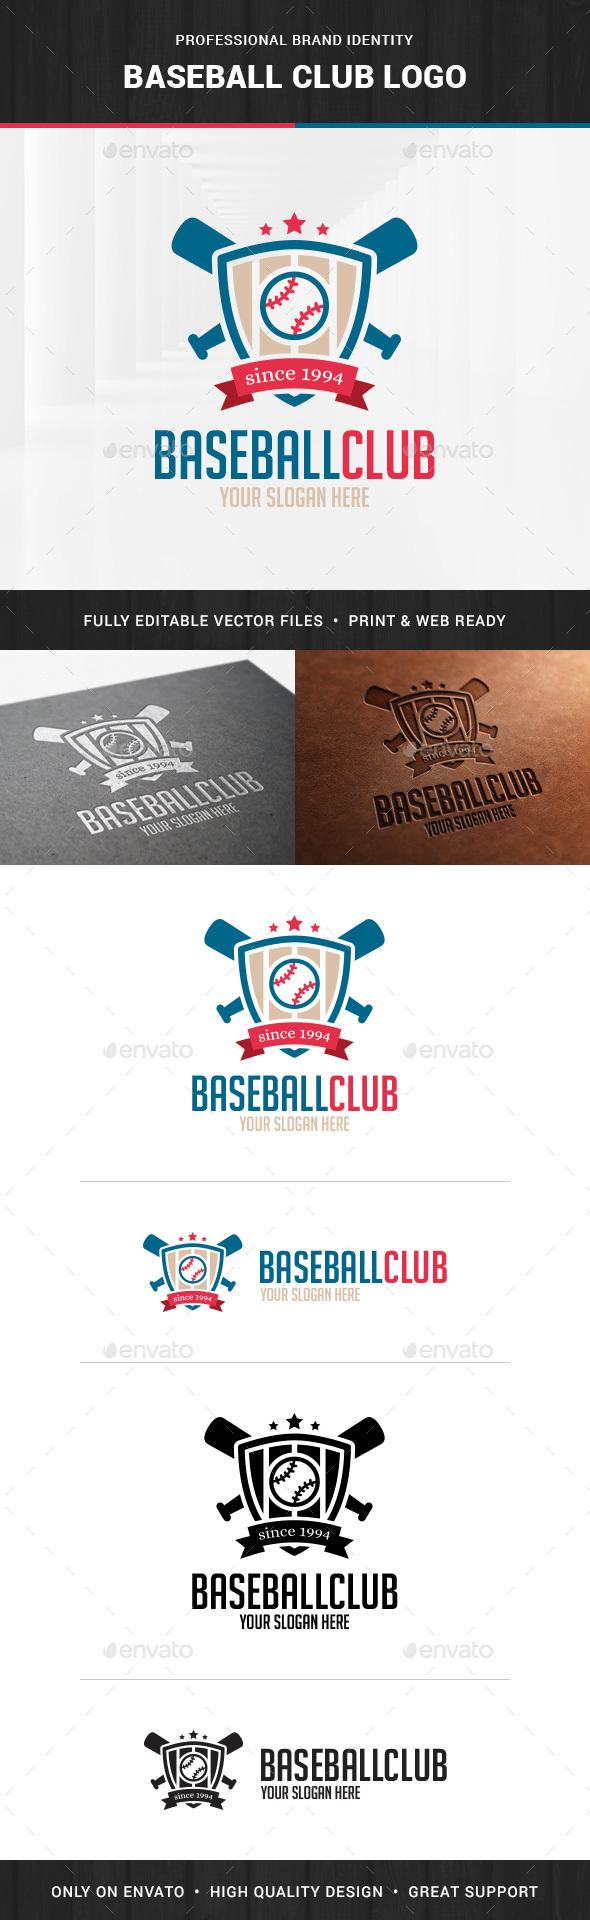 Baseball Club Logo Template